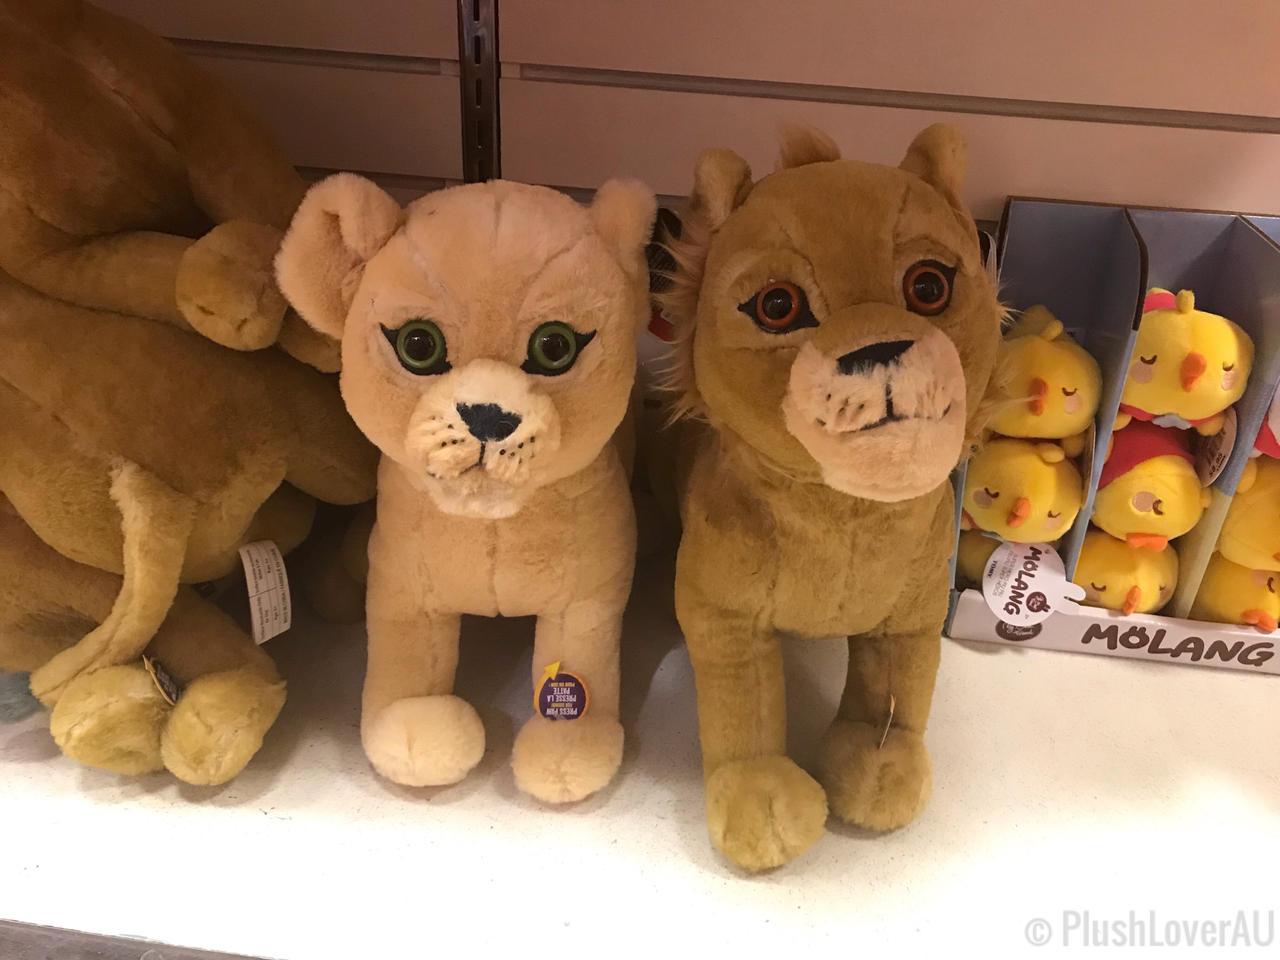 Lion King Plushies 2019 By Plushloverau On Deviantart